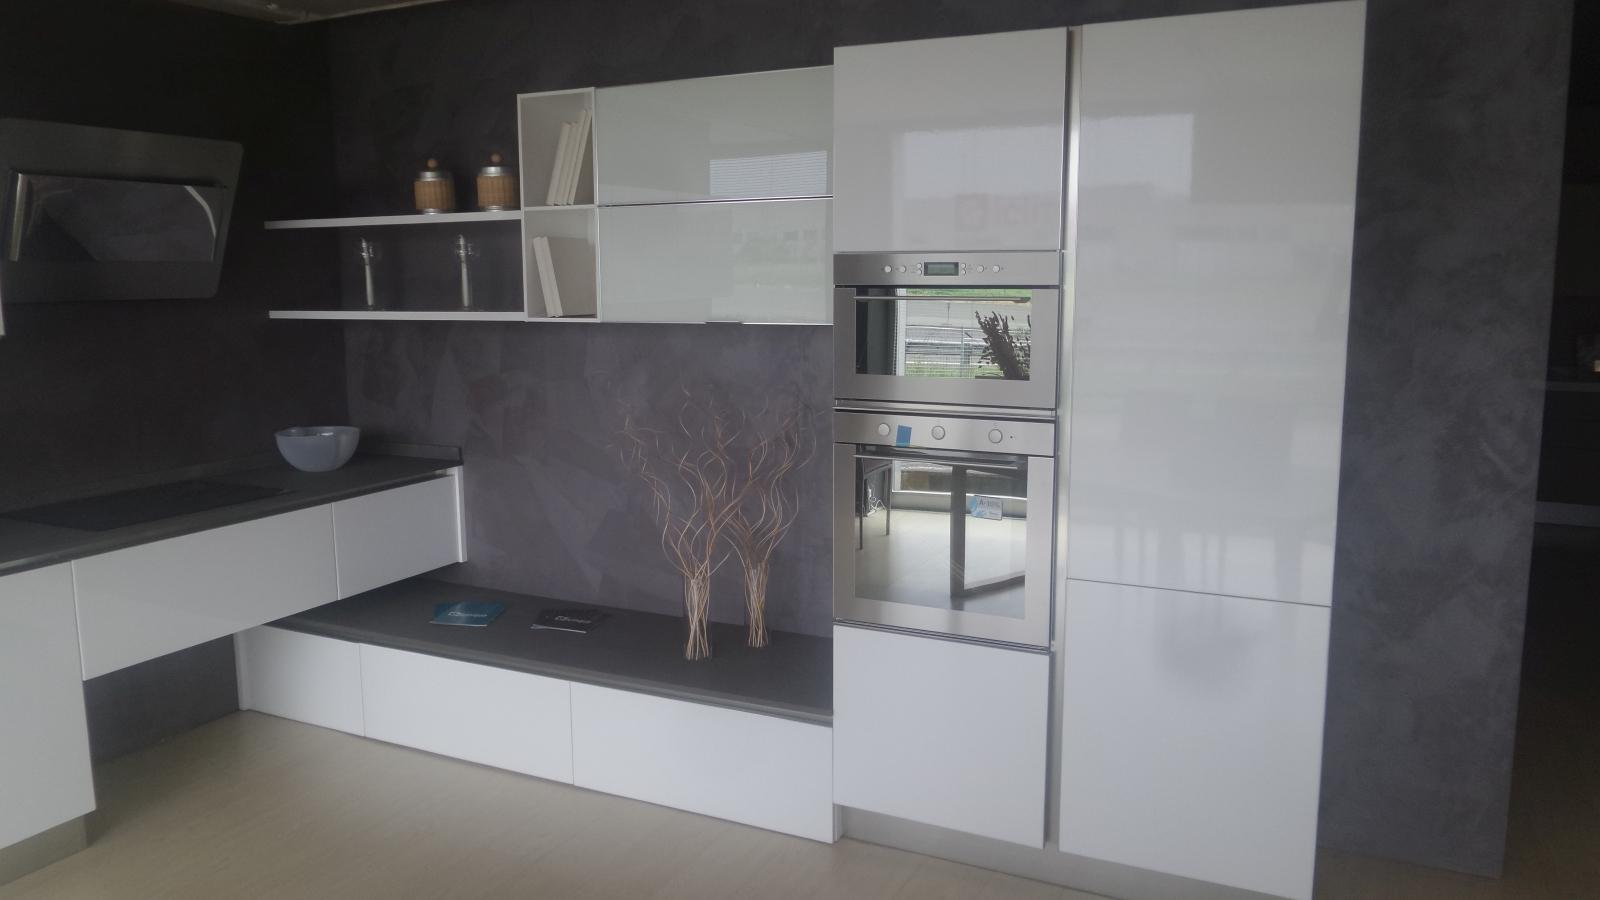 Cucina g5 cucina mod slim polimerico bianco lucido - Cucina bianco lucido ...